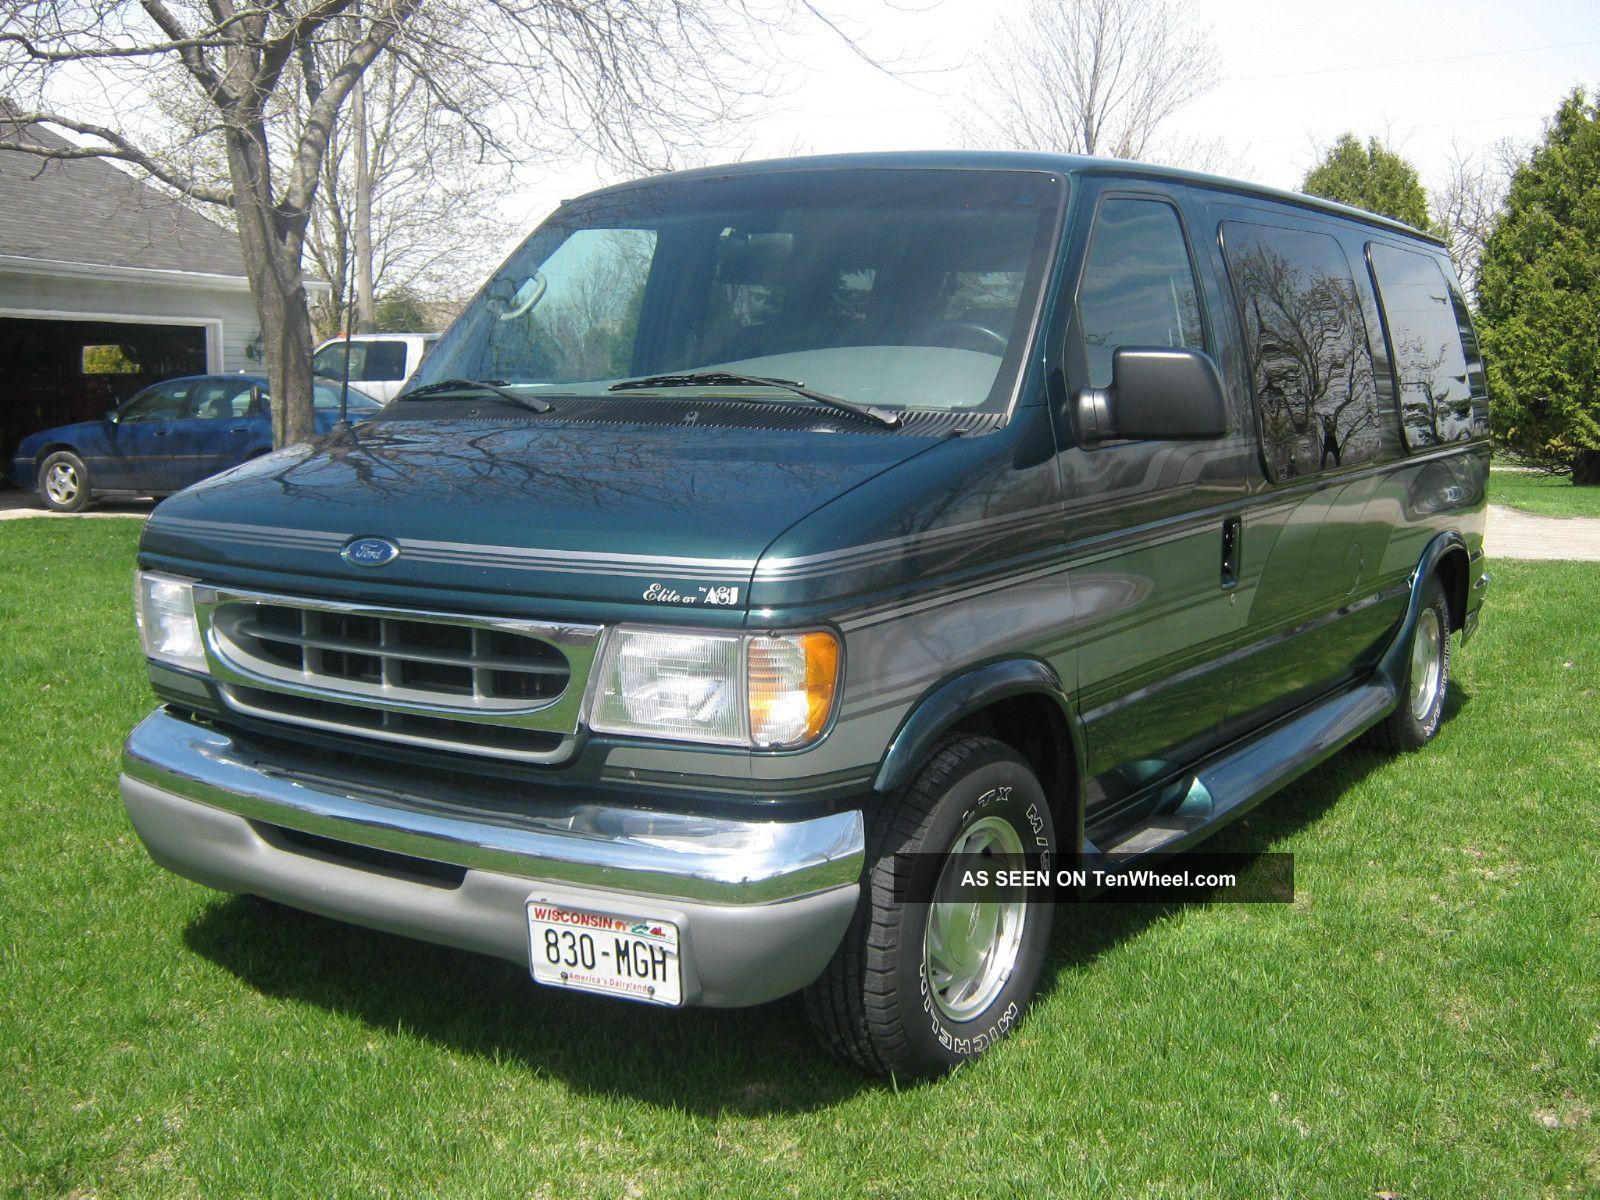 2001 ford e 150 econoline a j elite gt conversion van 4. Black Bedroom Furniture Sets. Home Design Ideas